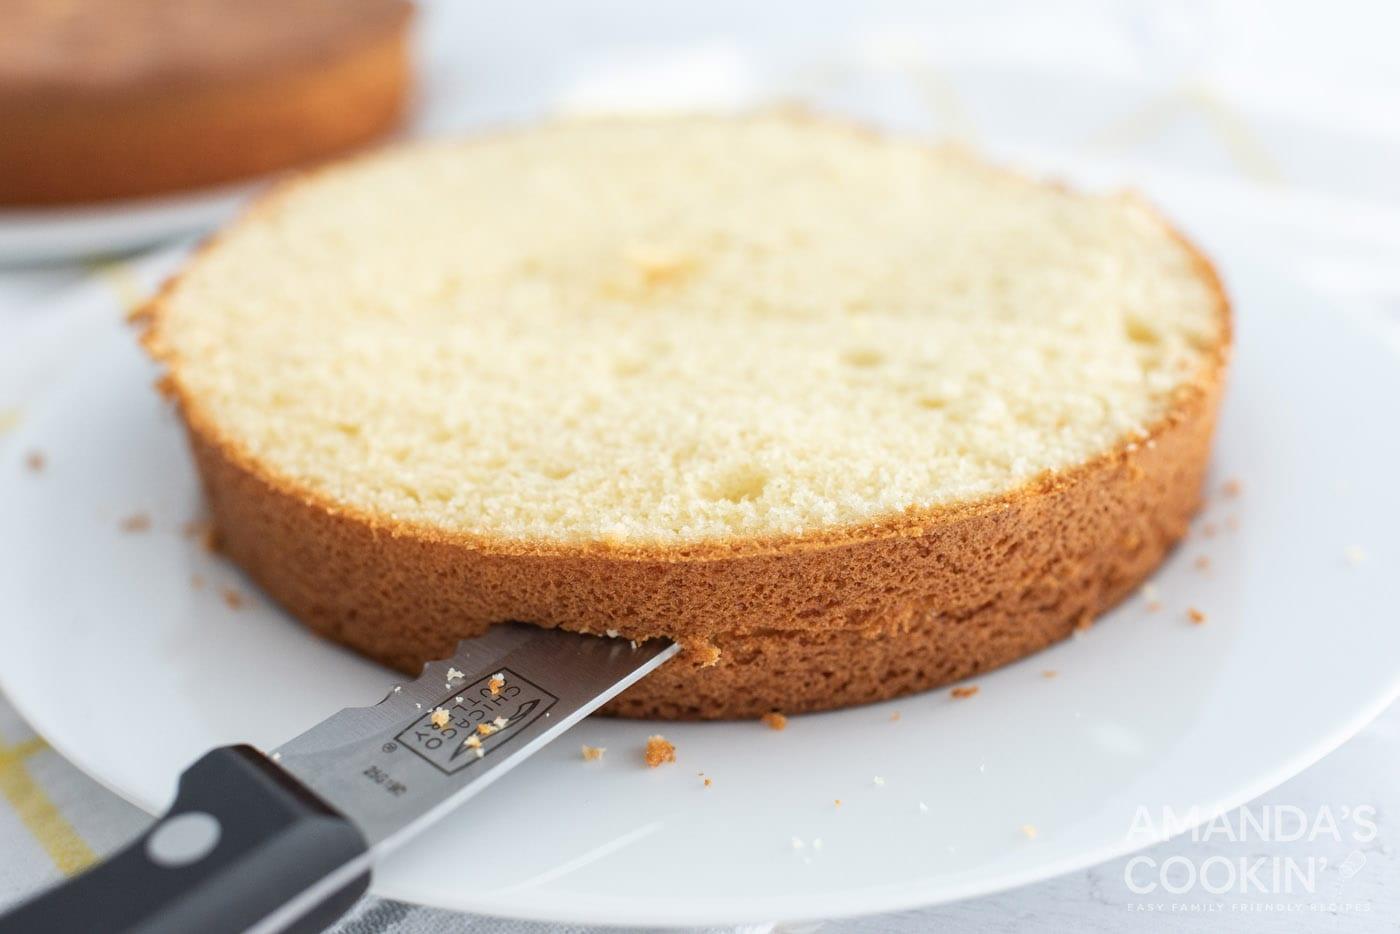 knife cutting cake in half